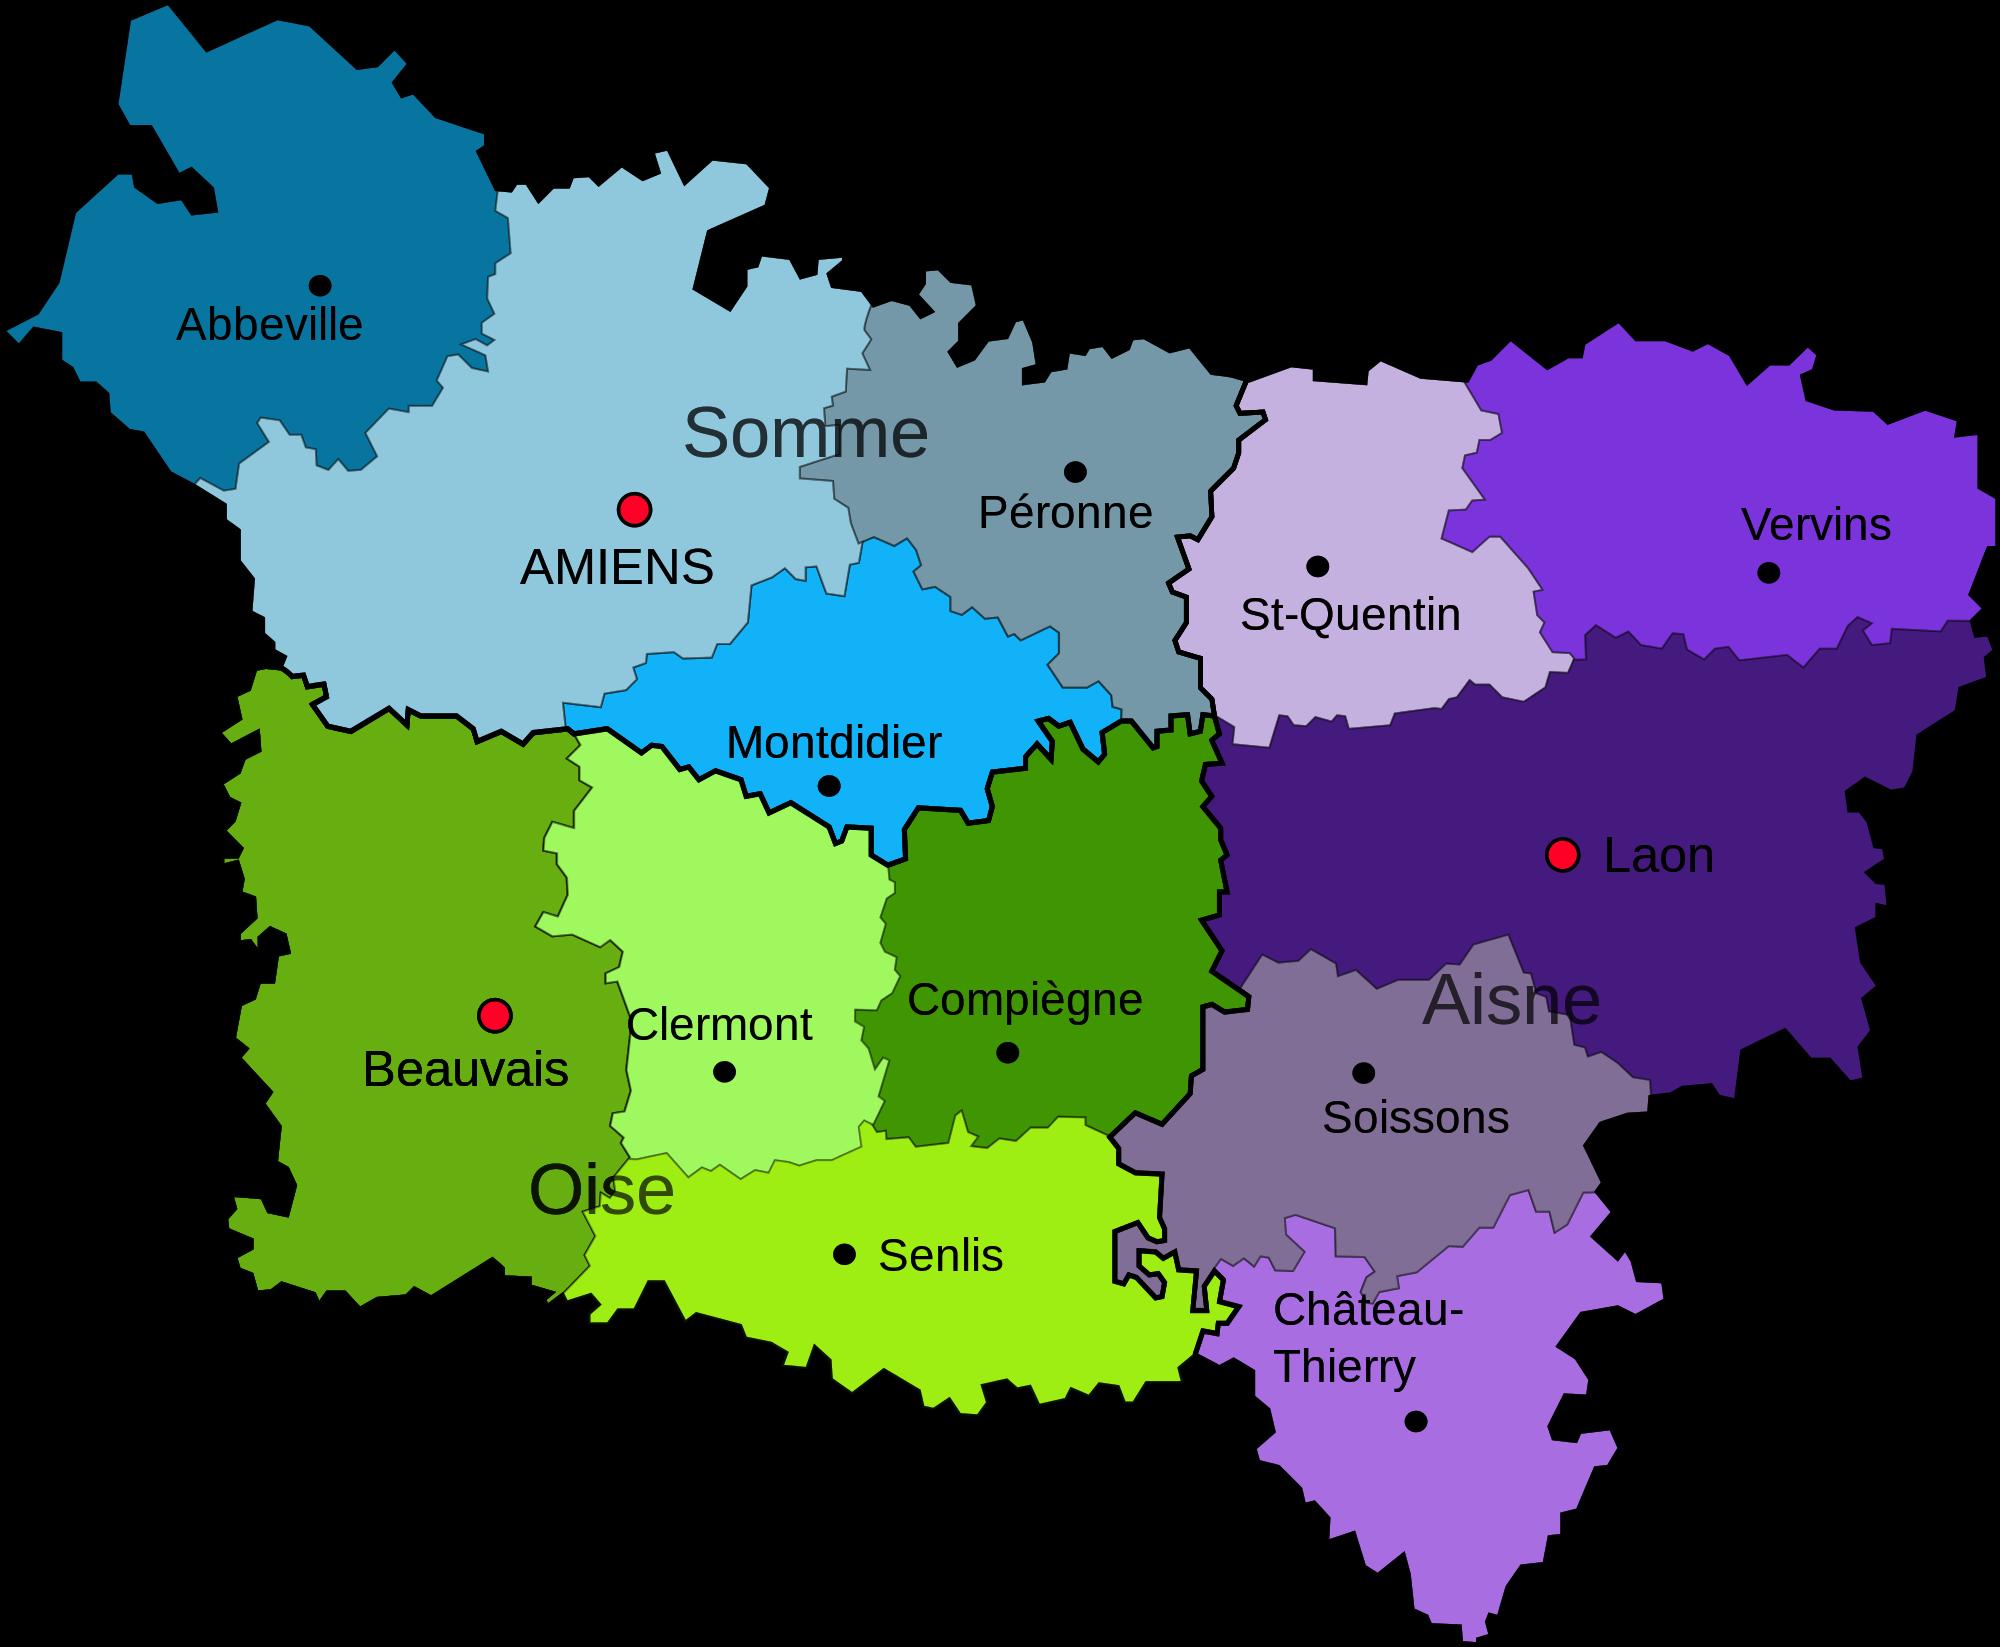 Carte de la division de la Picardie